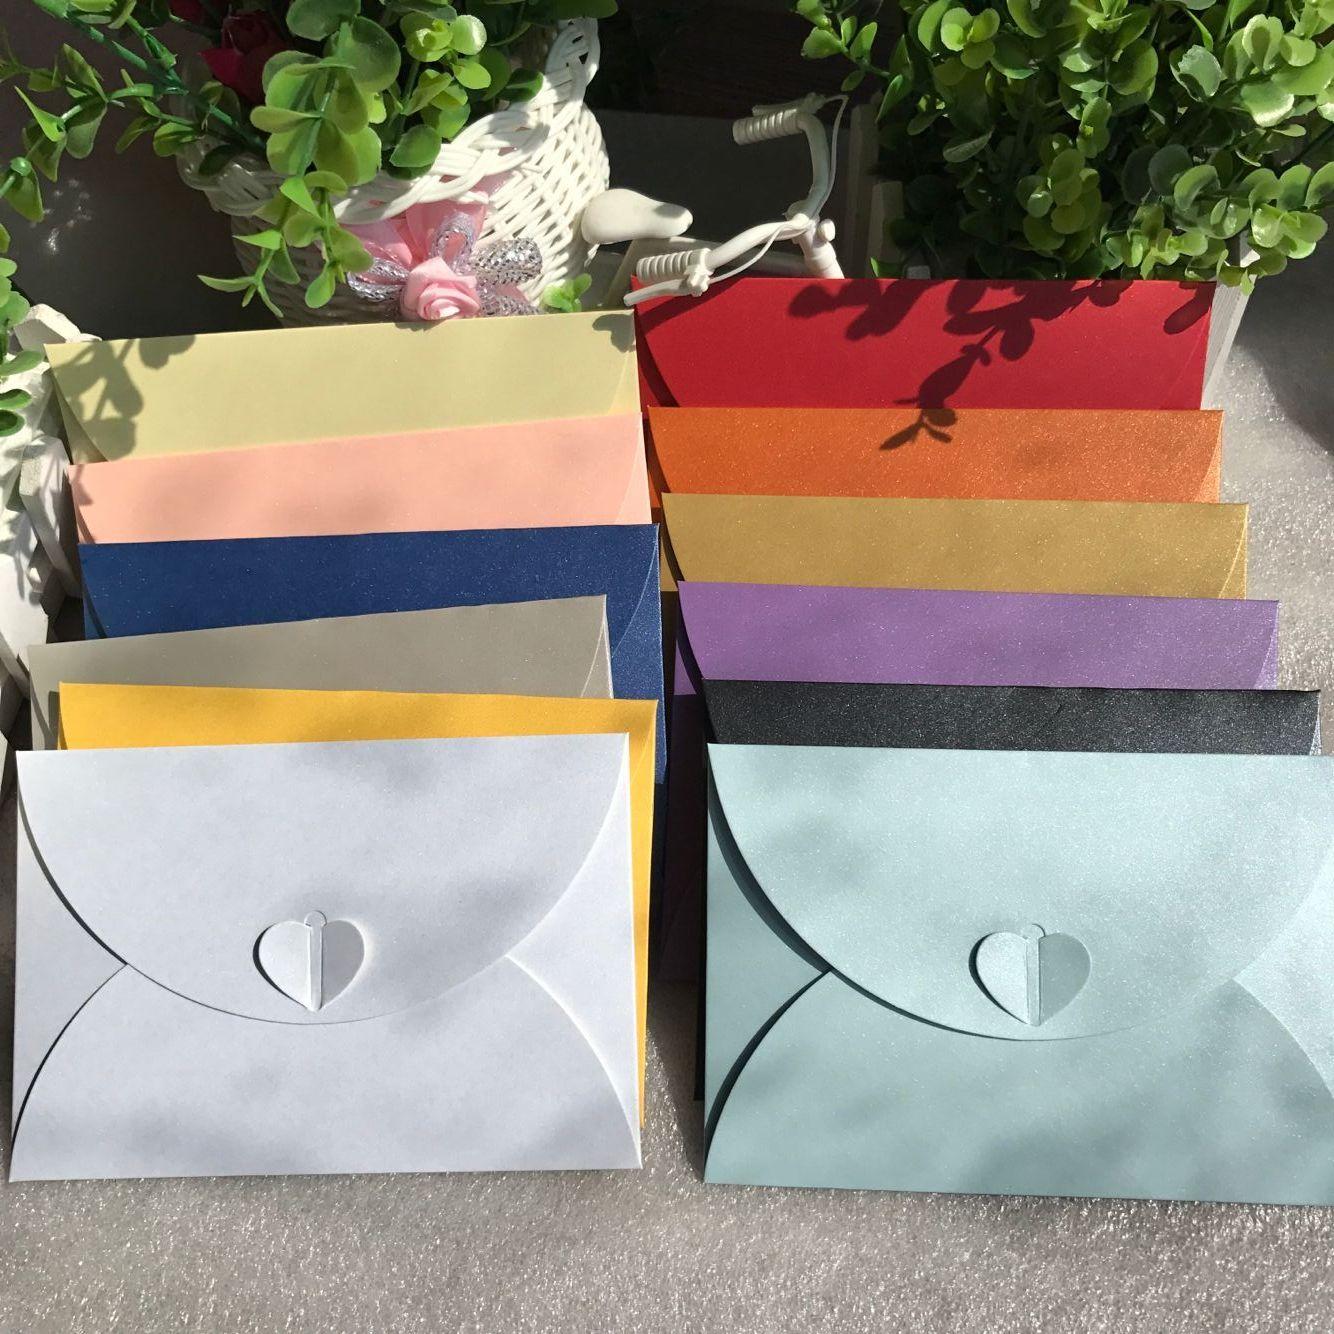 17.5*11cm Big 20pcs/bag Retro Love Buckle Envelope DIY Romantic Kraft Envelope Creative Heart Buckle Decoration Love Envelope